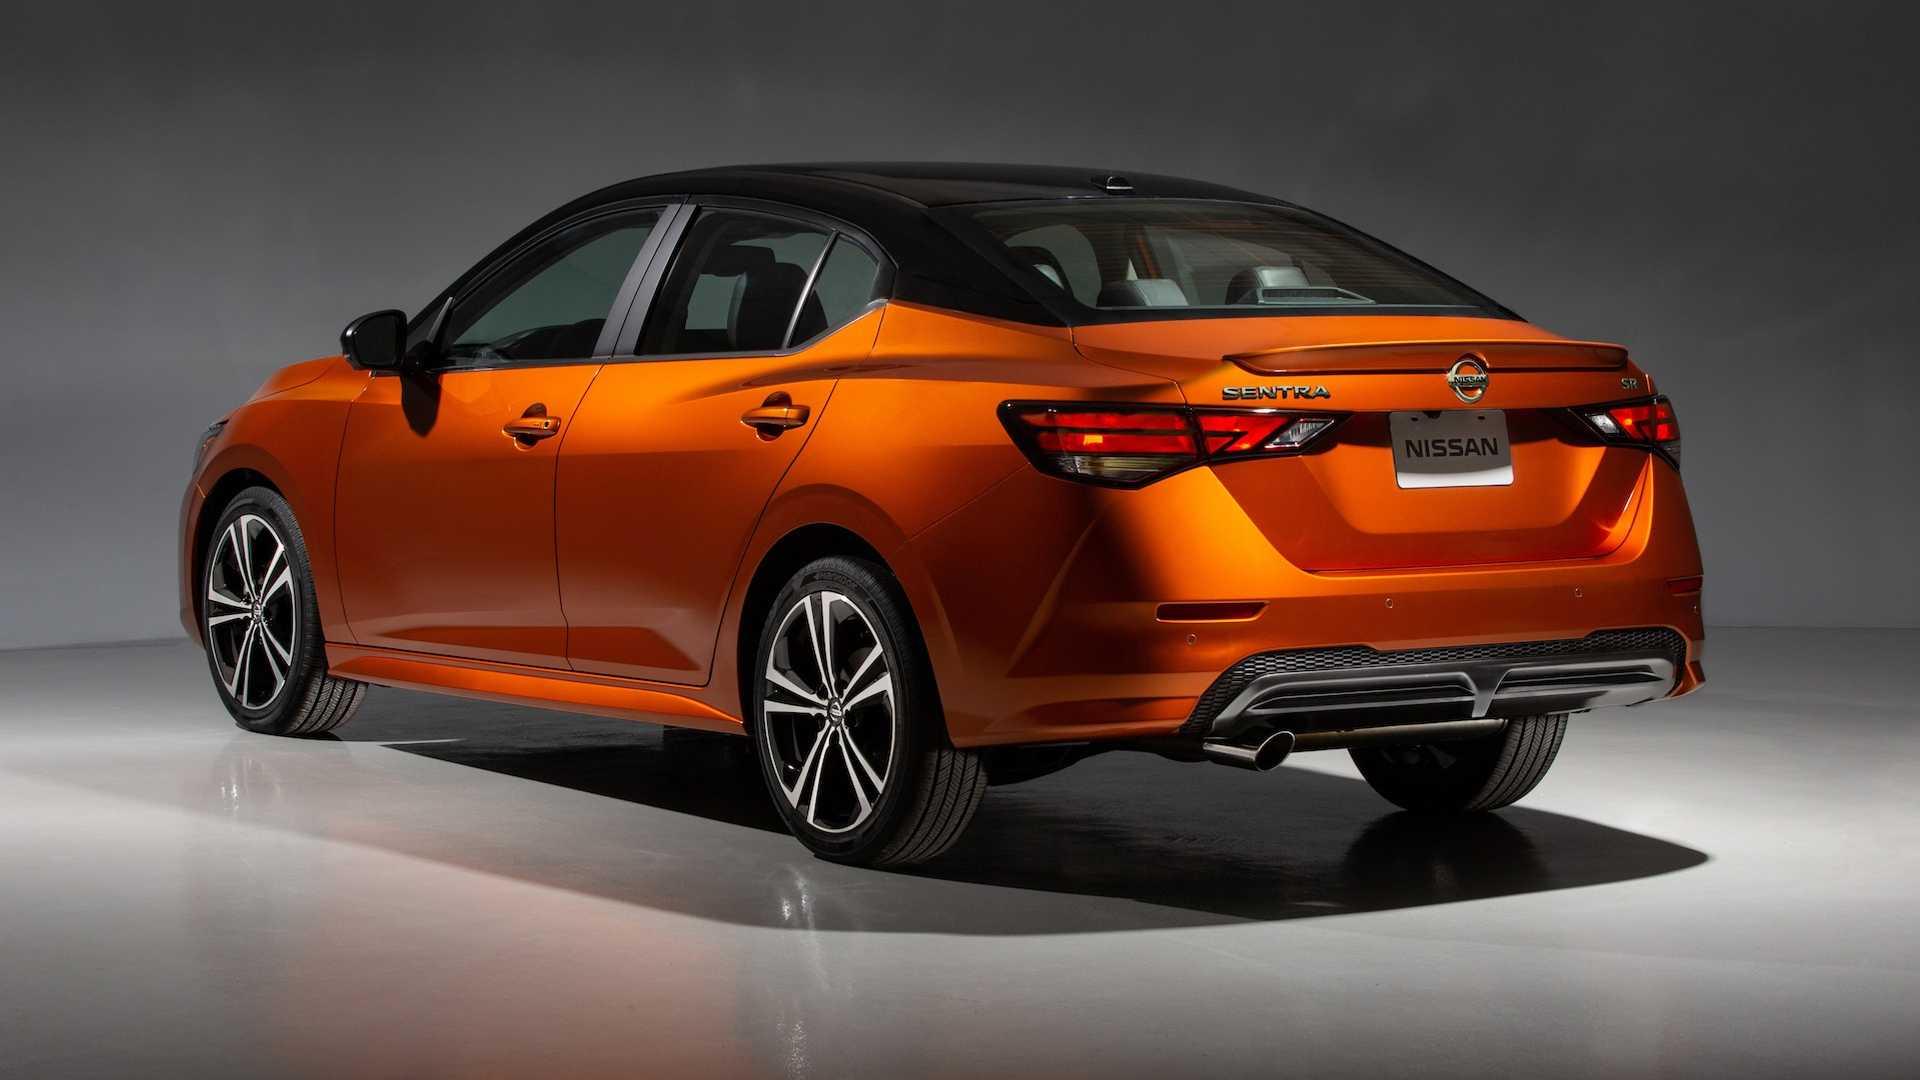 Nissan Sentra thế hệ mới